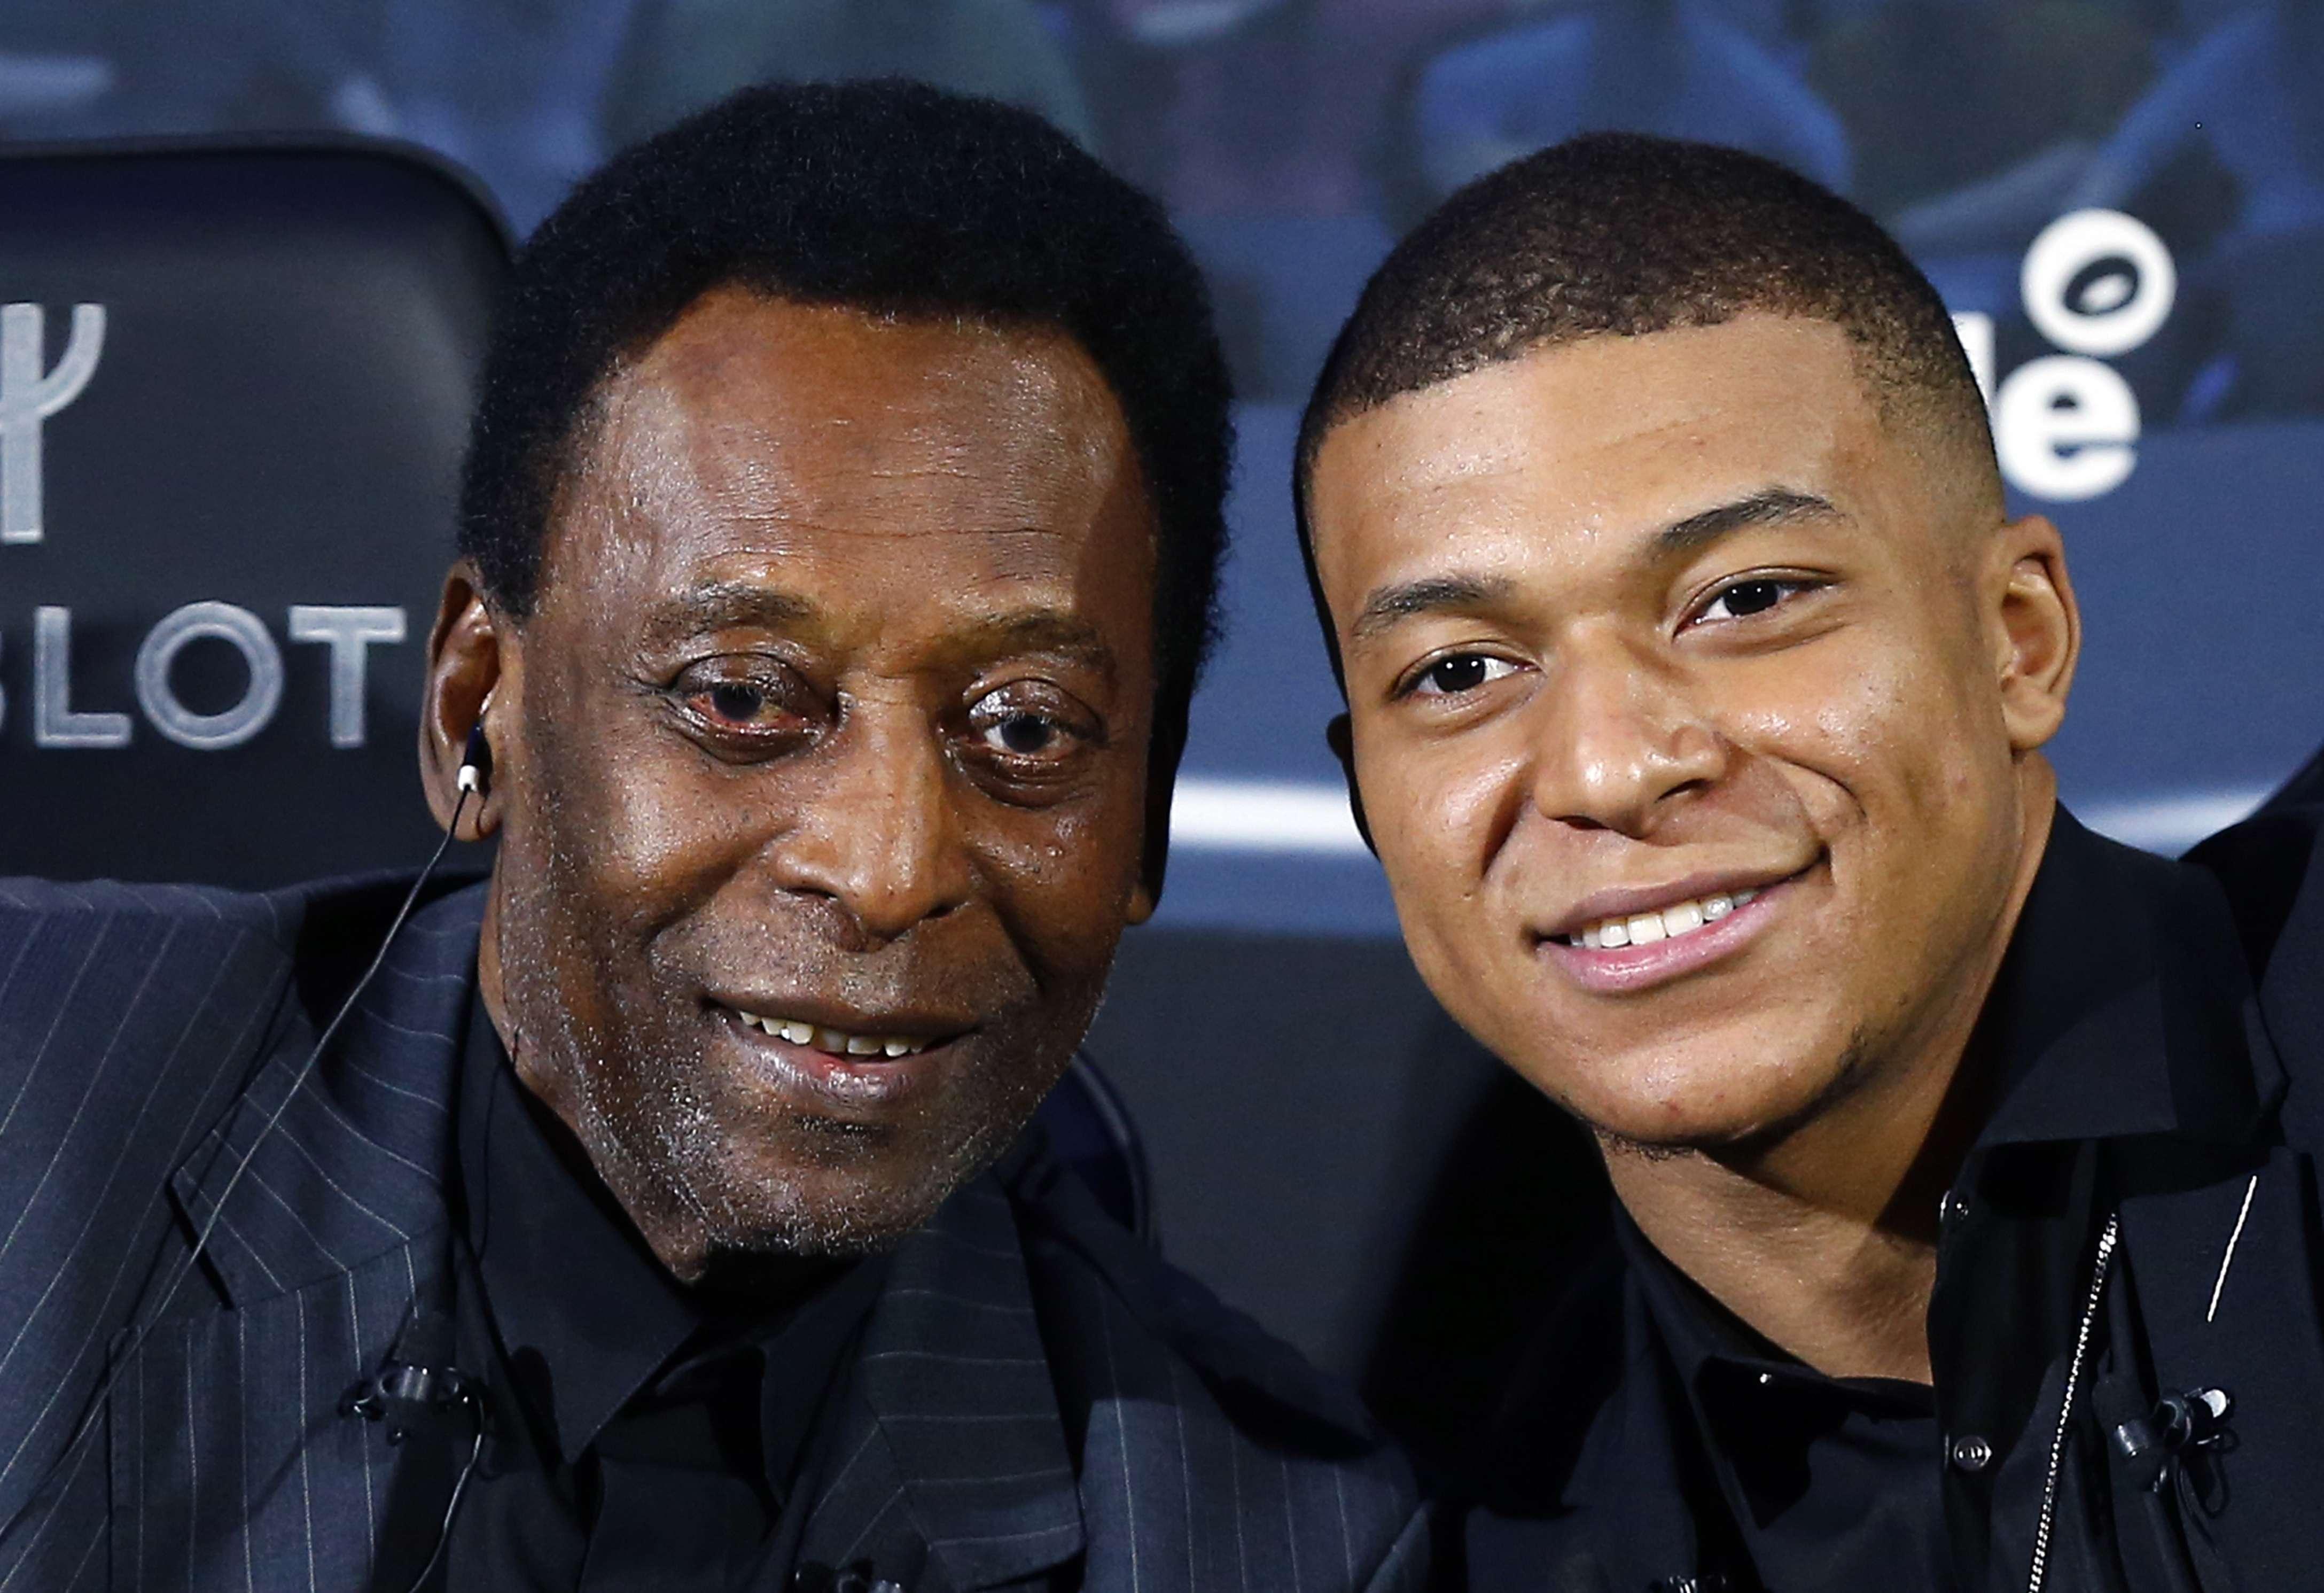 Brasil: Pelé se opera por cálculo renal